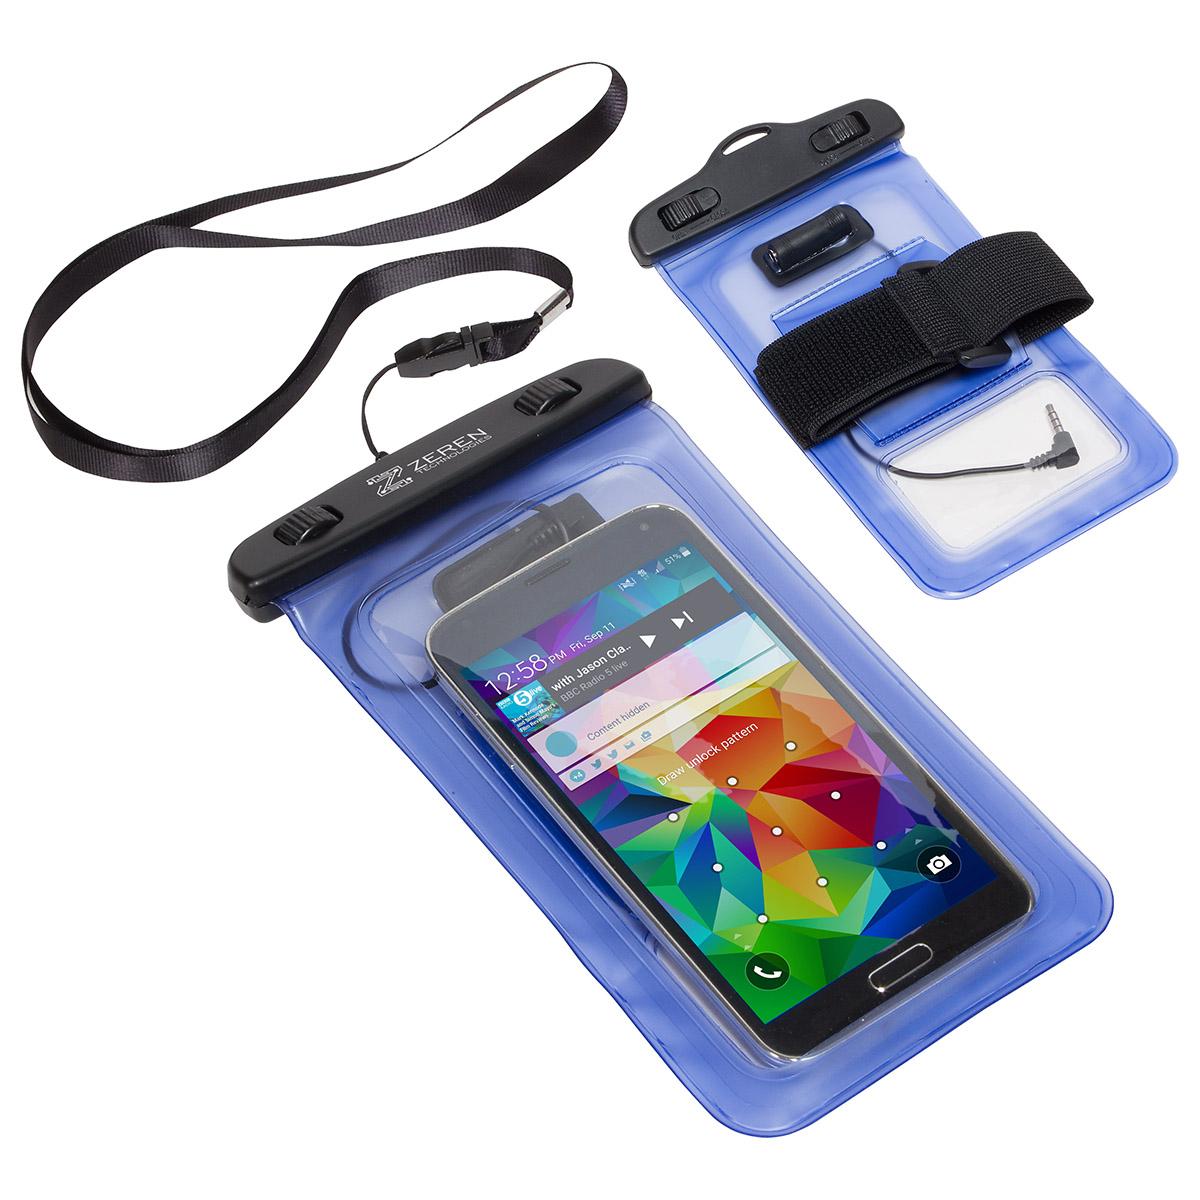 Dual Use Waterproof Smart Phone Case w/ Audio Jack, WOR-SP16 - 1 Colour Imprint